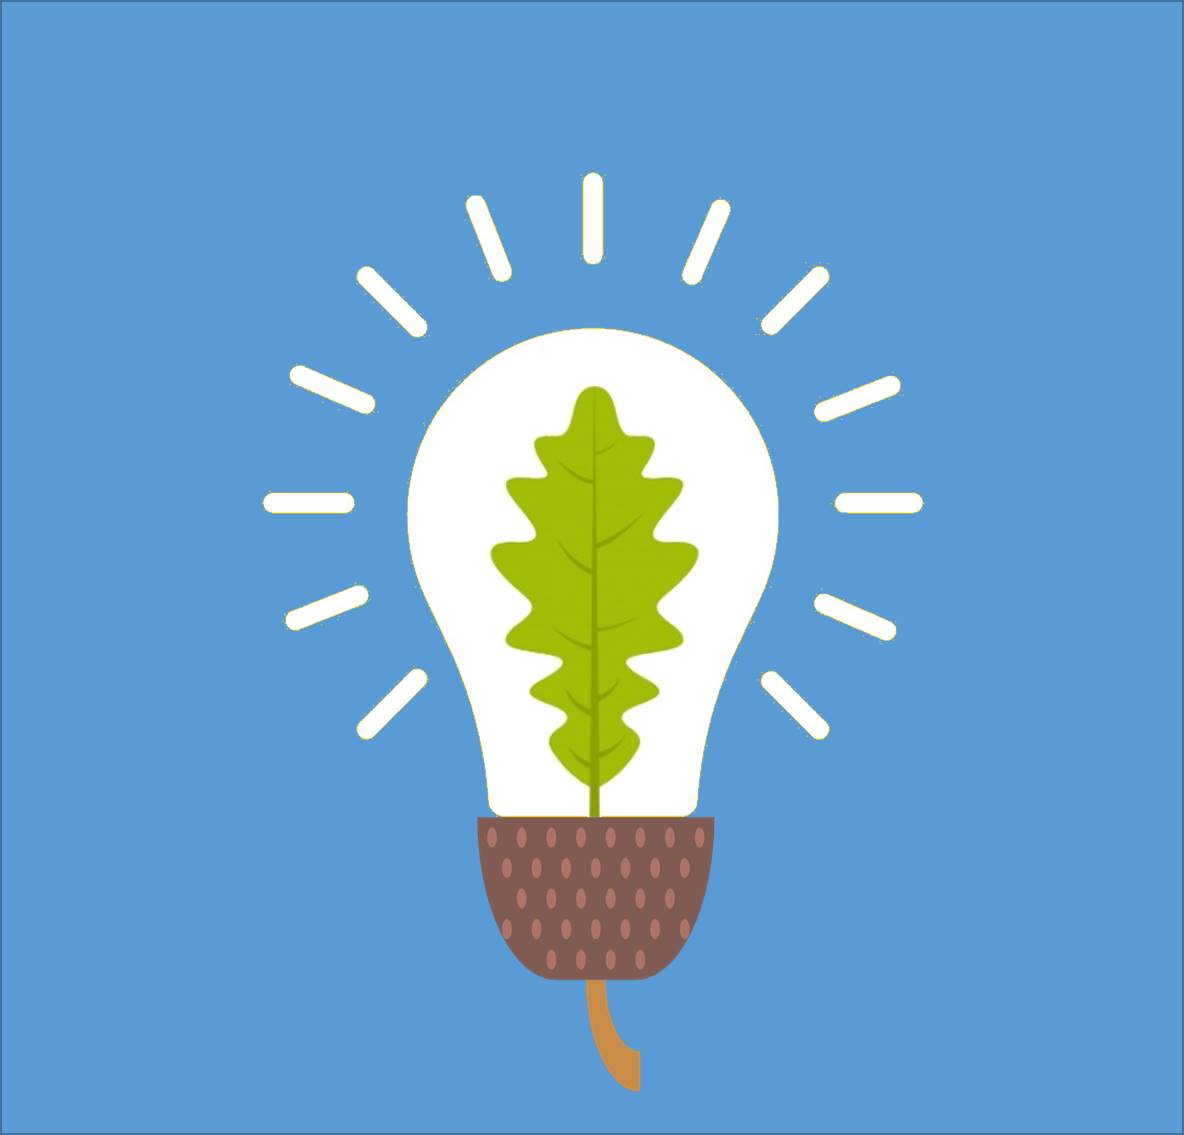 Acorn / Oak leaf lightbulb